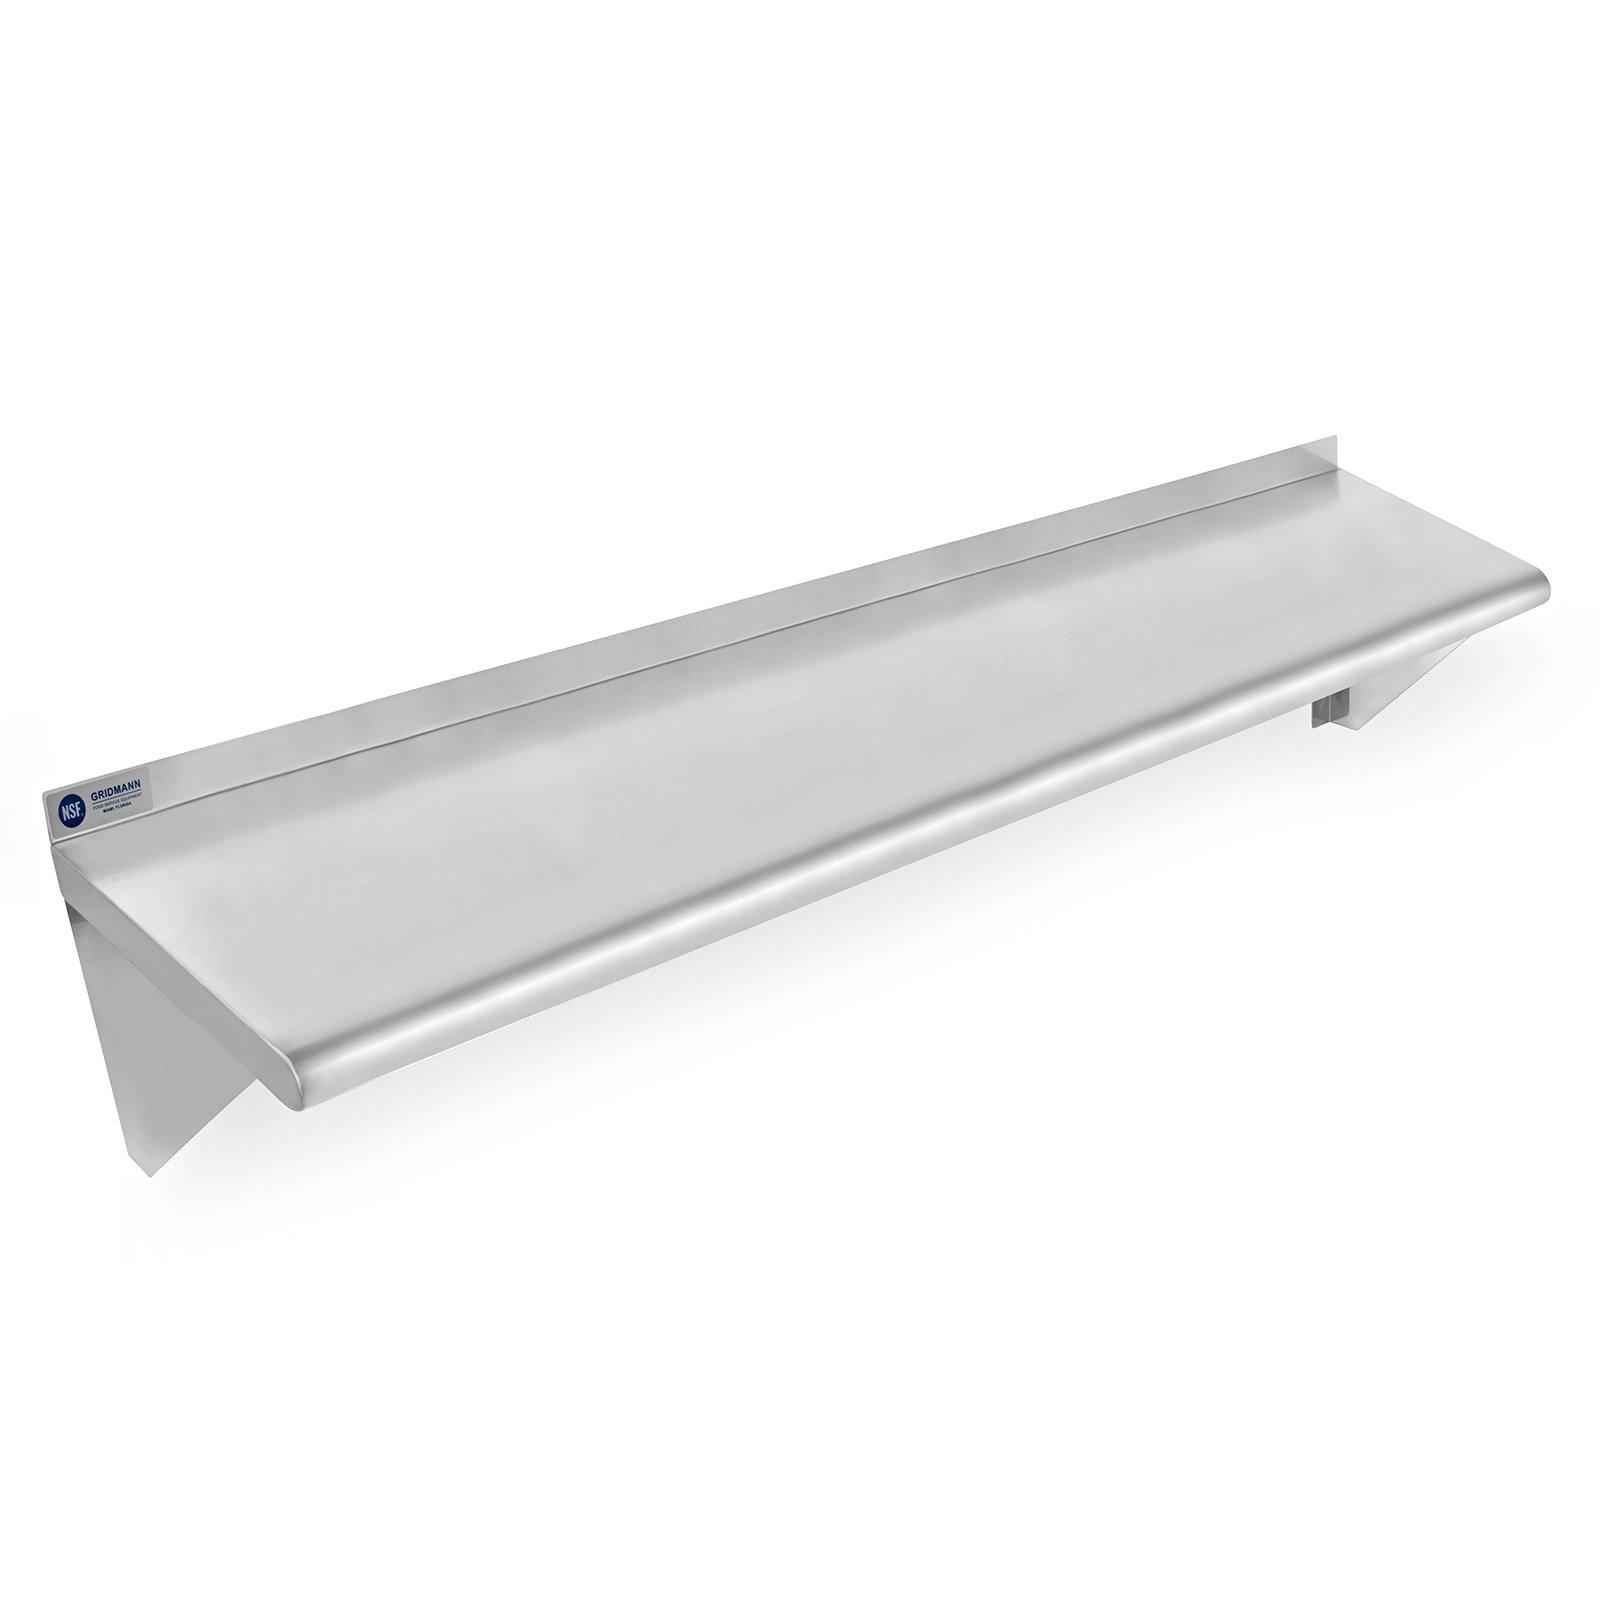 Gridmann NSF Stainless Steel Kitchen Wall Mount Shelf Commercial Restaurant Bar w/ Backsplash - 12'' x 48''